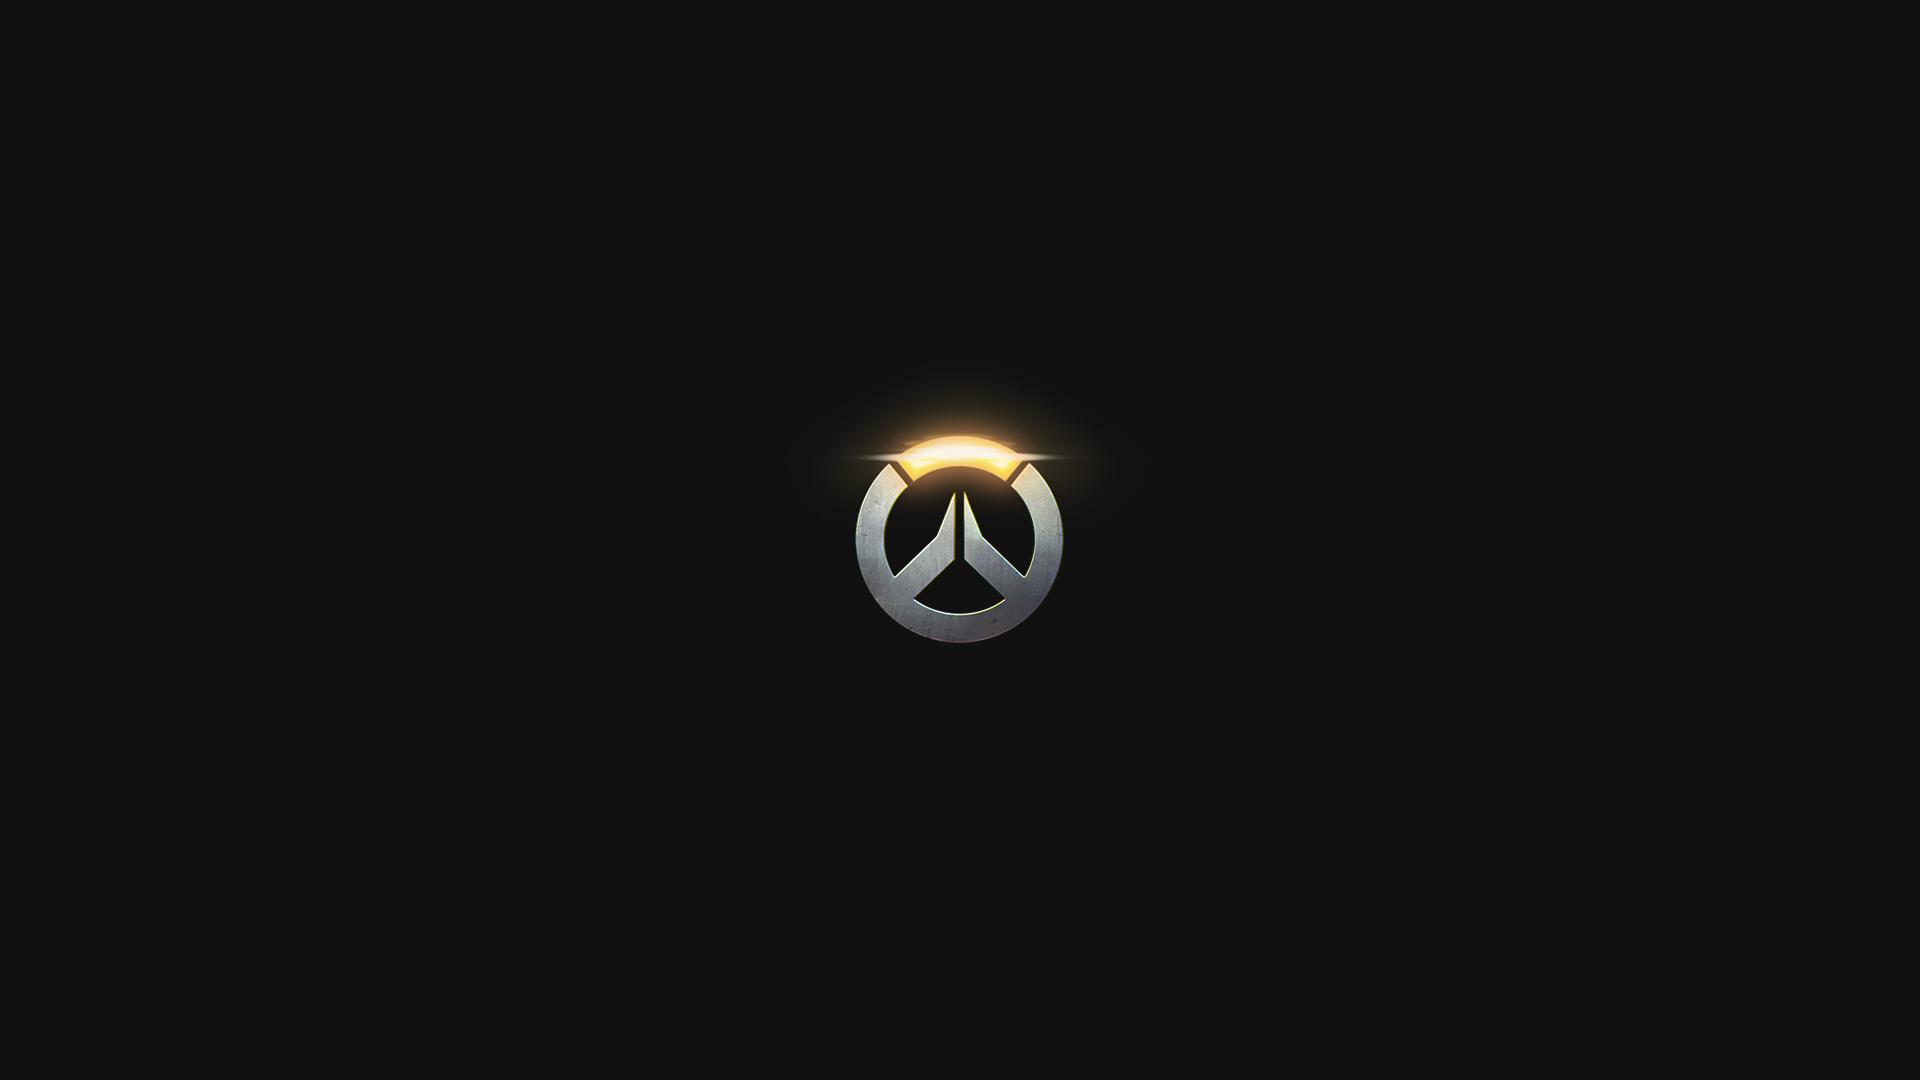 Overwatch Minimalistic 3 HD Wallpaper | Background Image ...